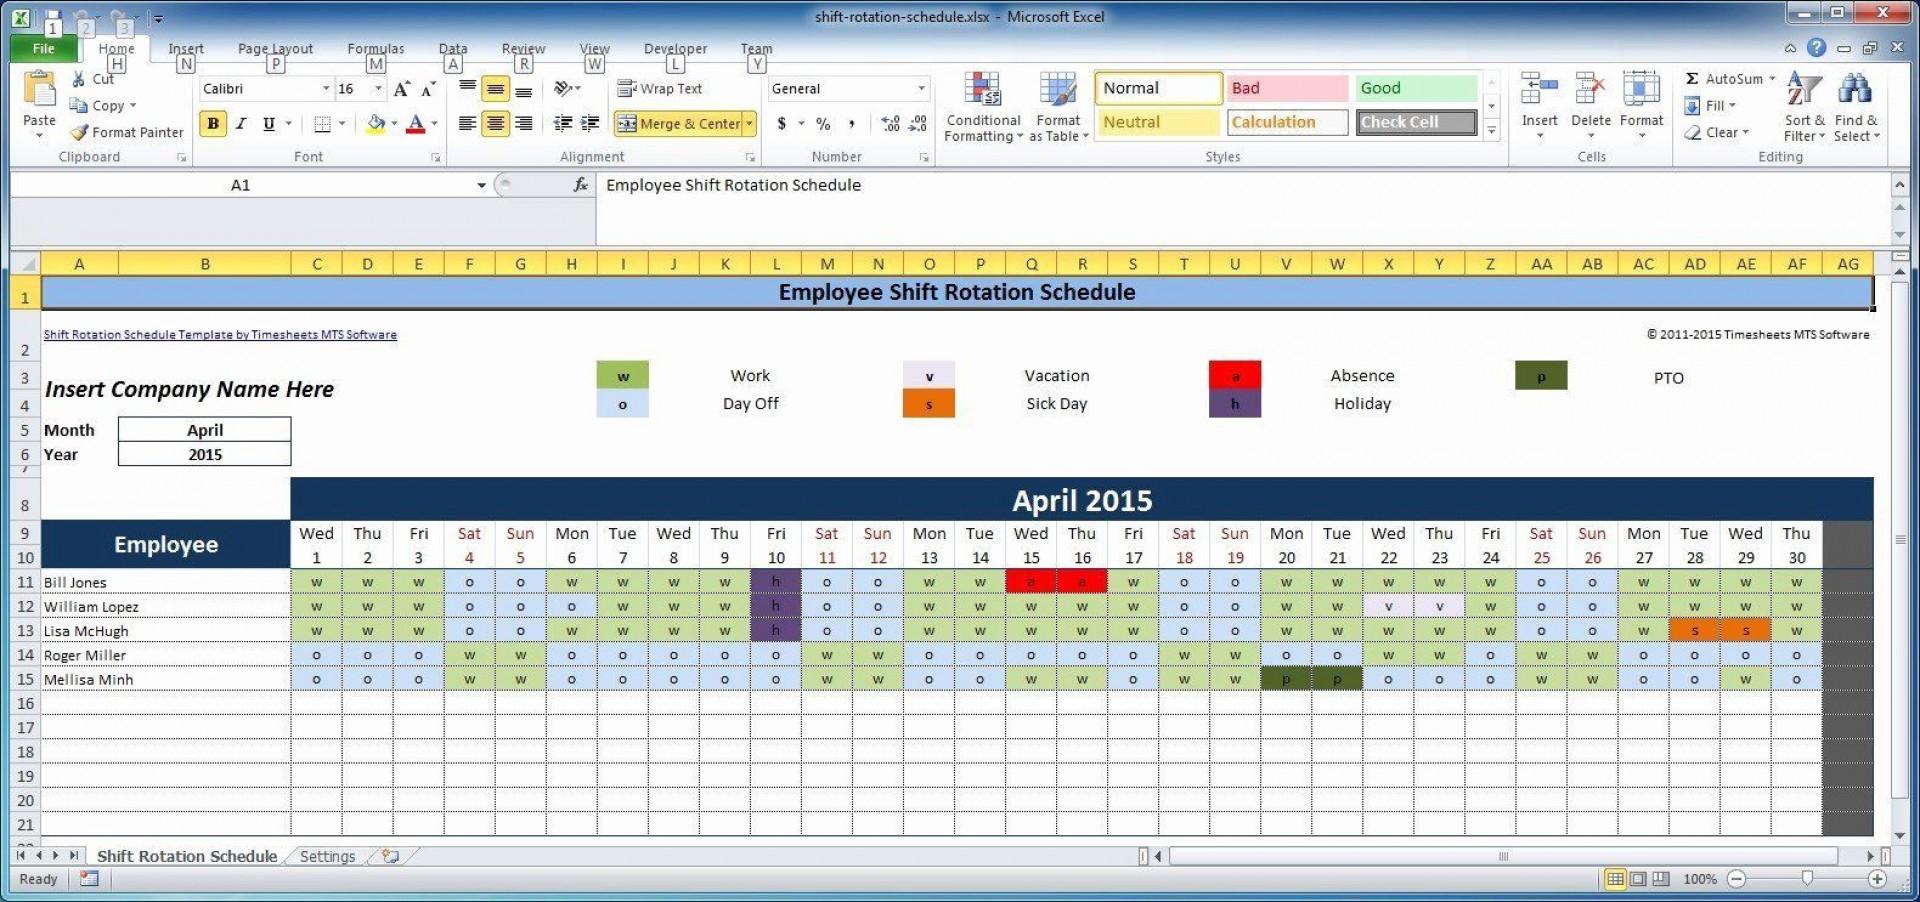 003 Fantastic Google Doc Employee Schedule Template High Def  Weekly Work1920